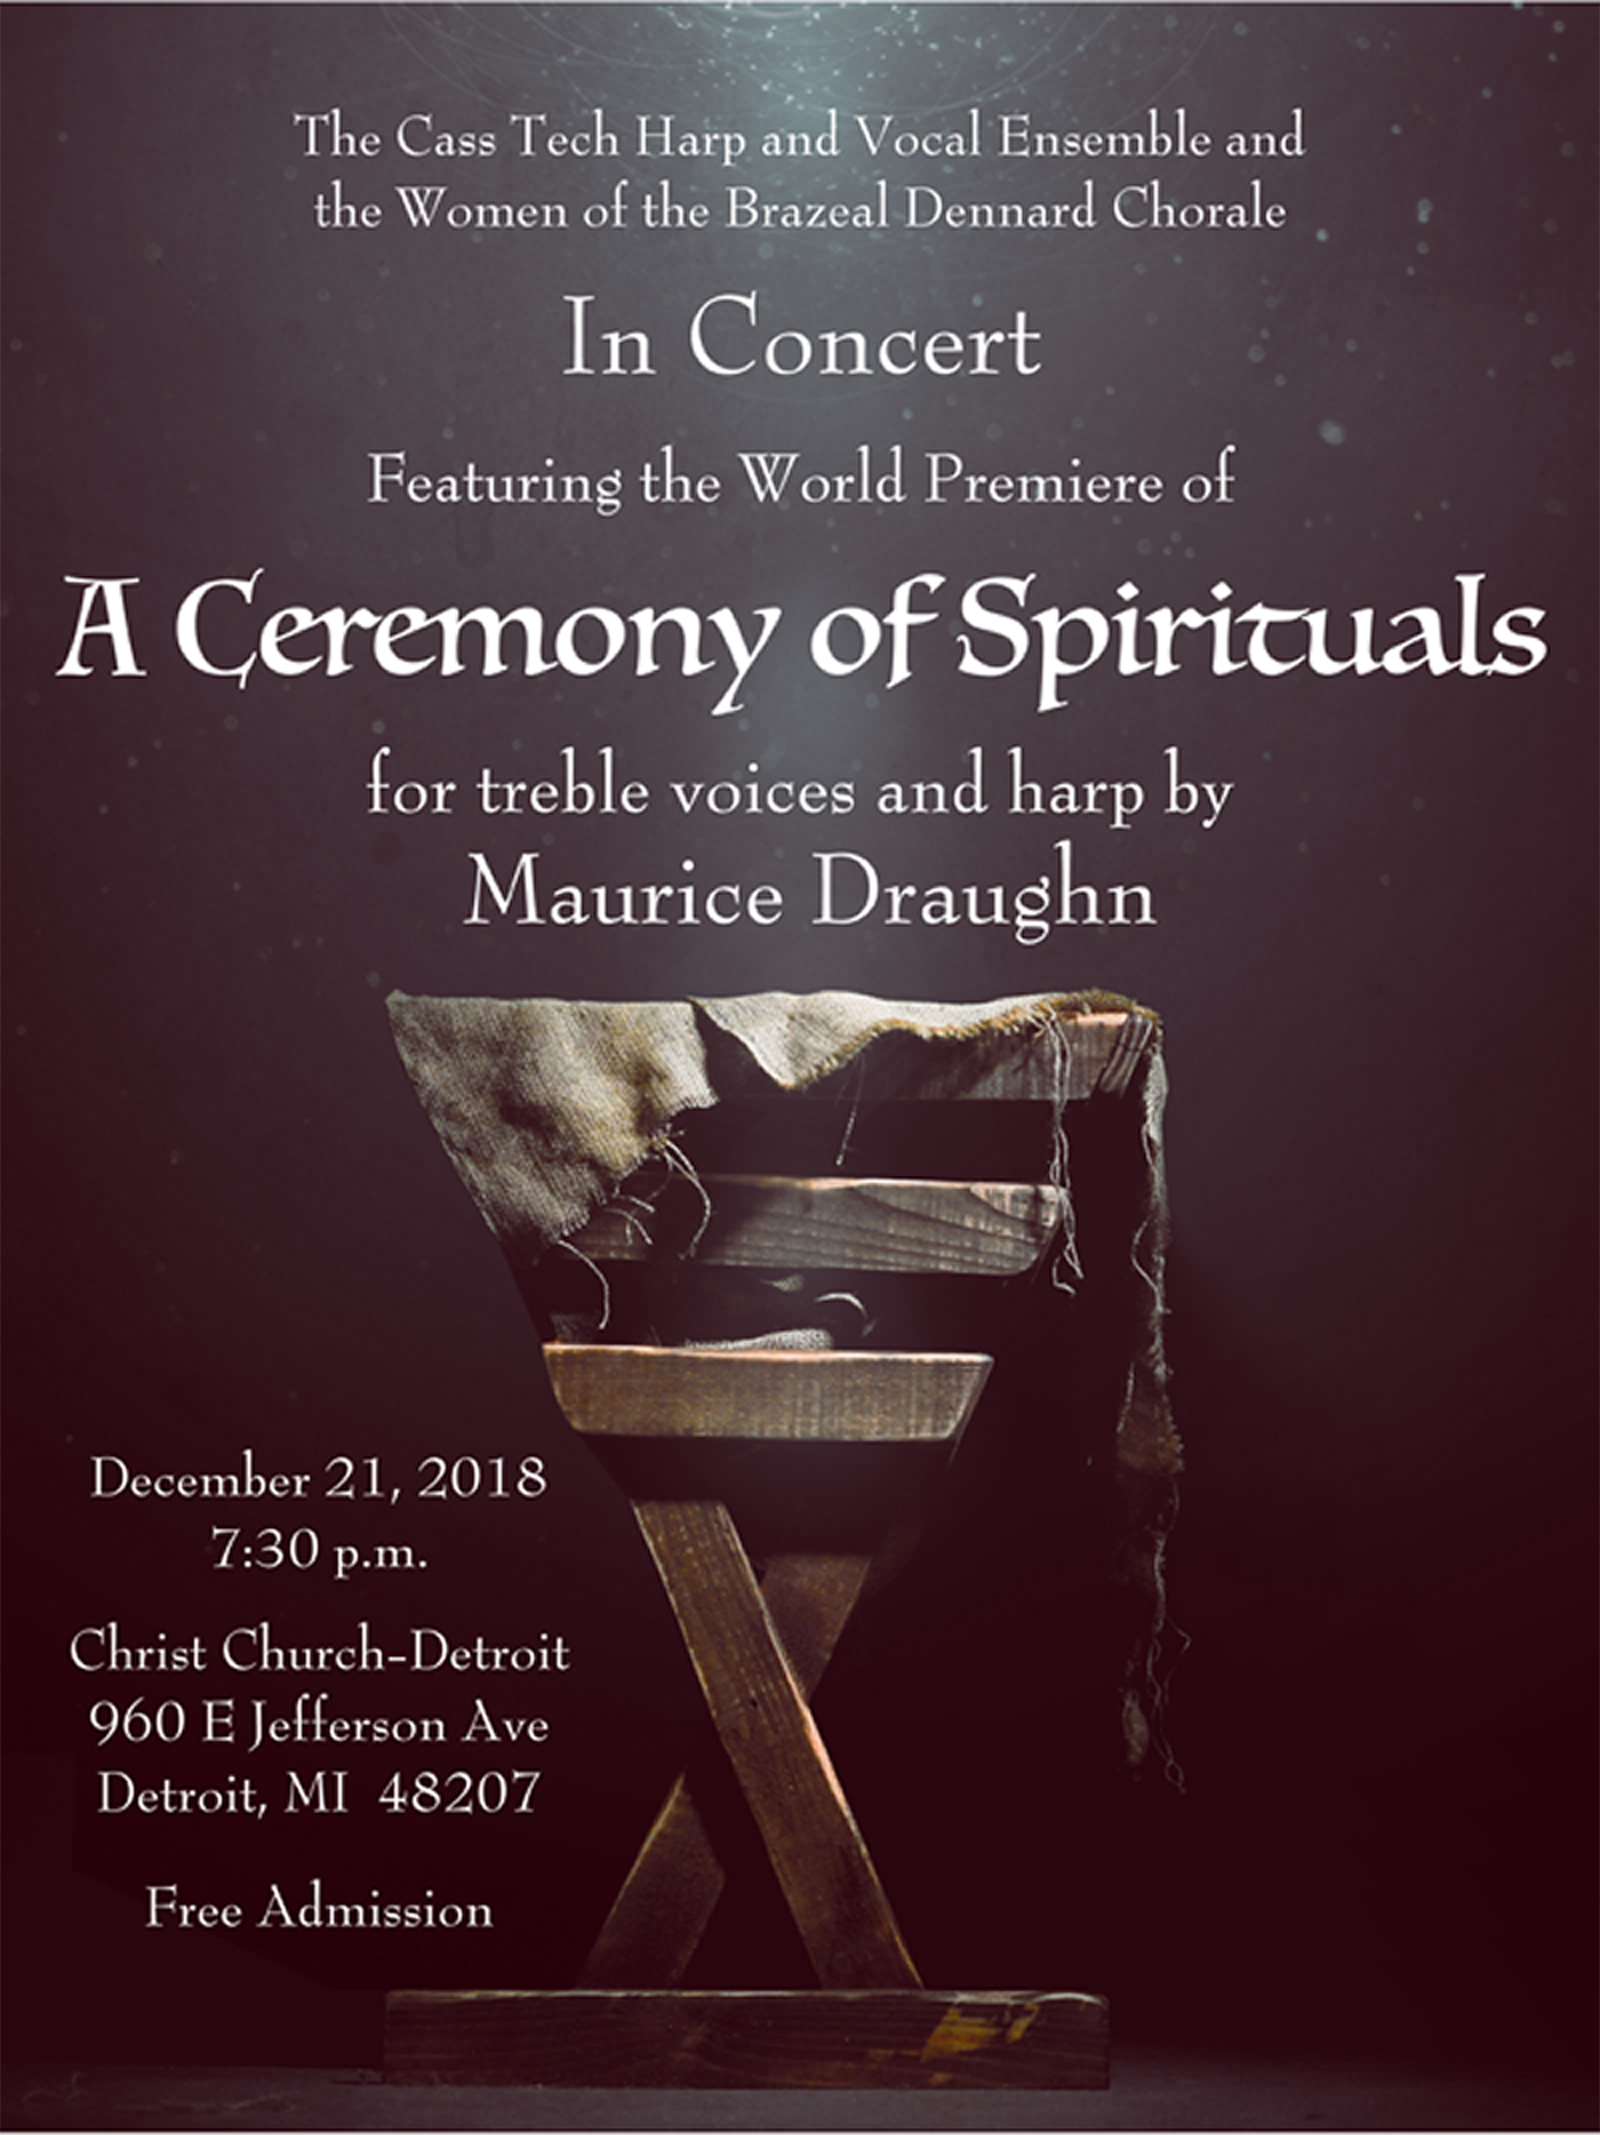 Events at Christ Church Detroit